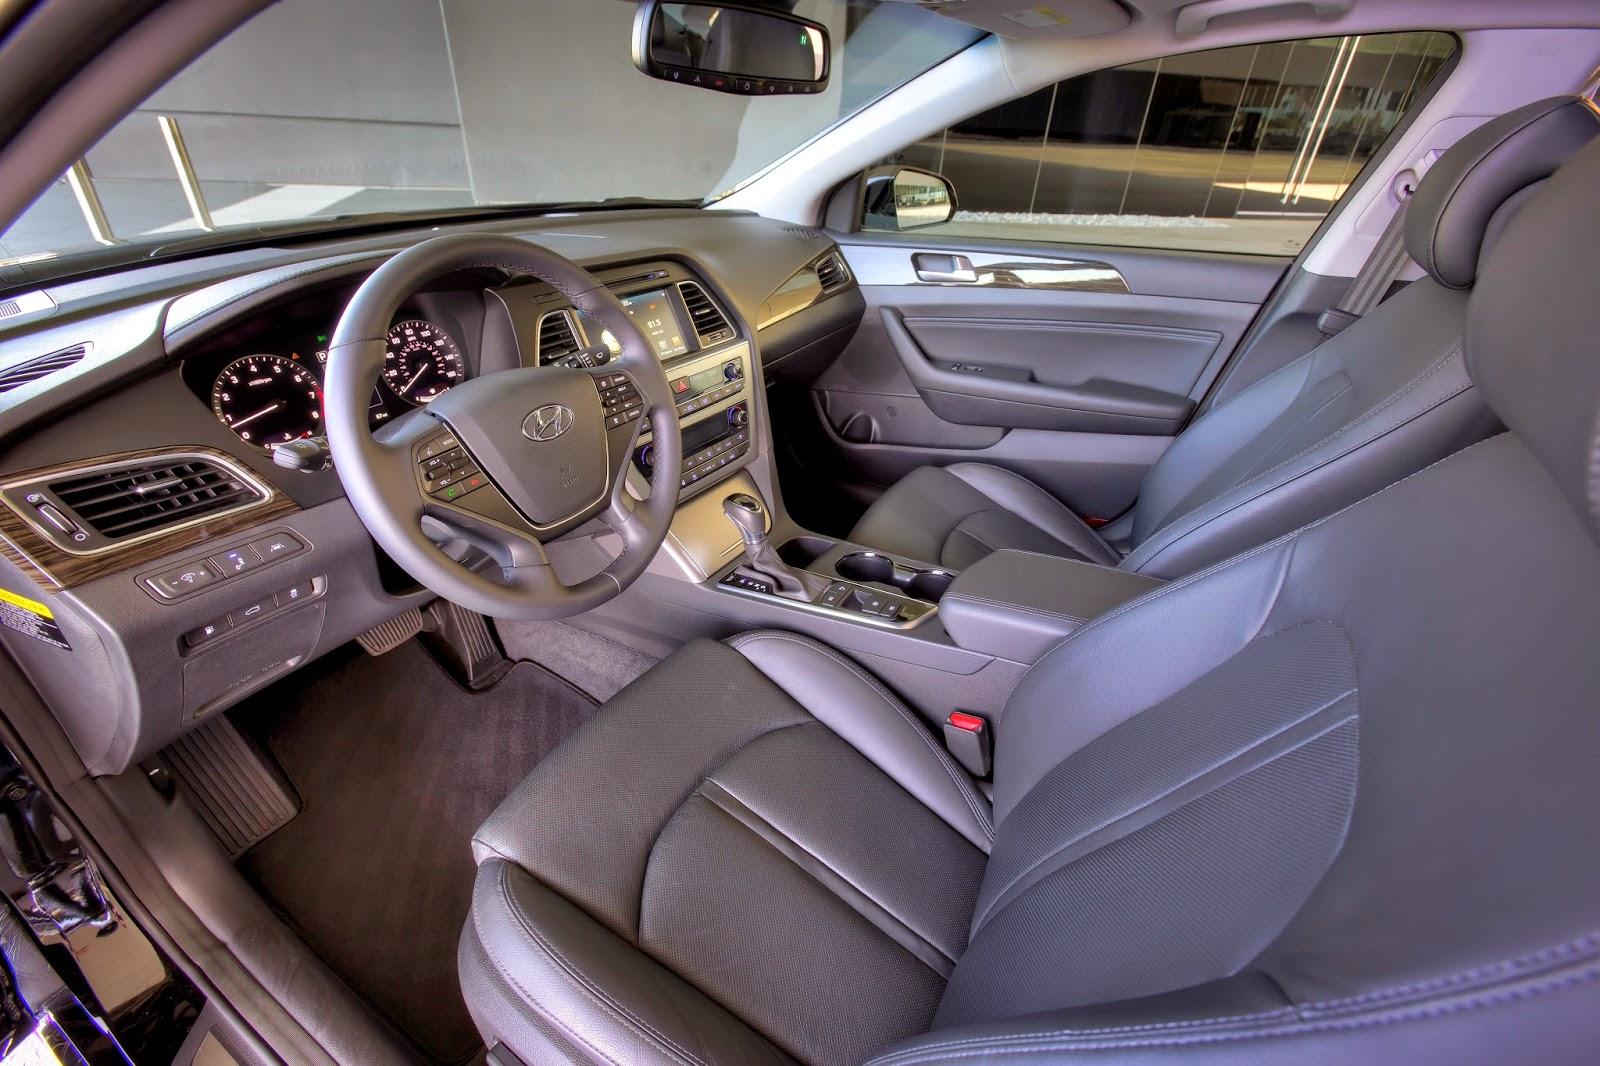 Interior view of 2015 Hyundai Sonata